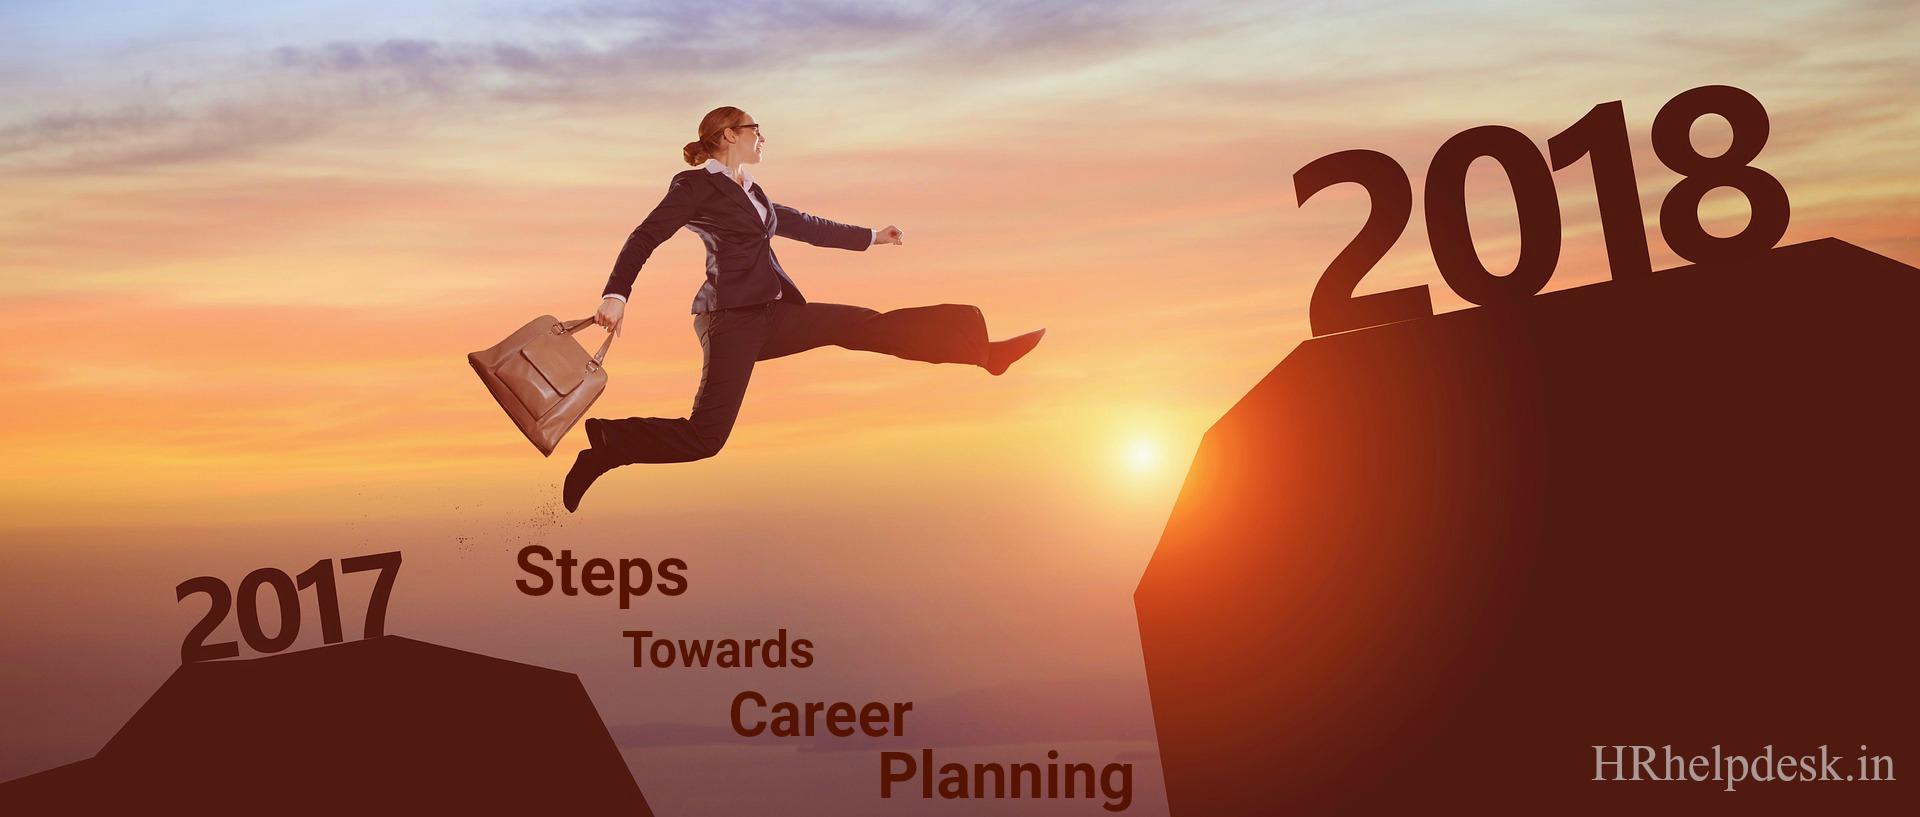 career planning HR helpdesk